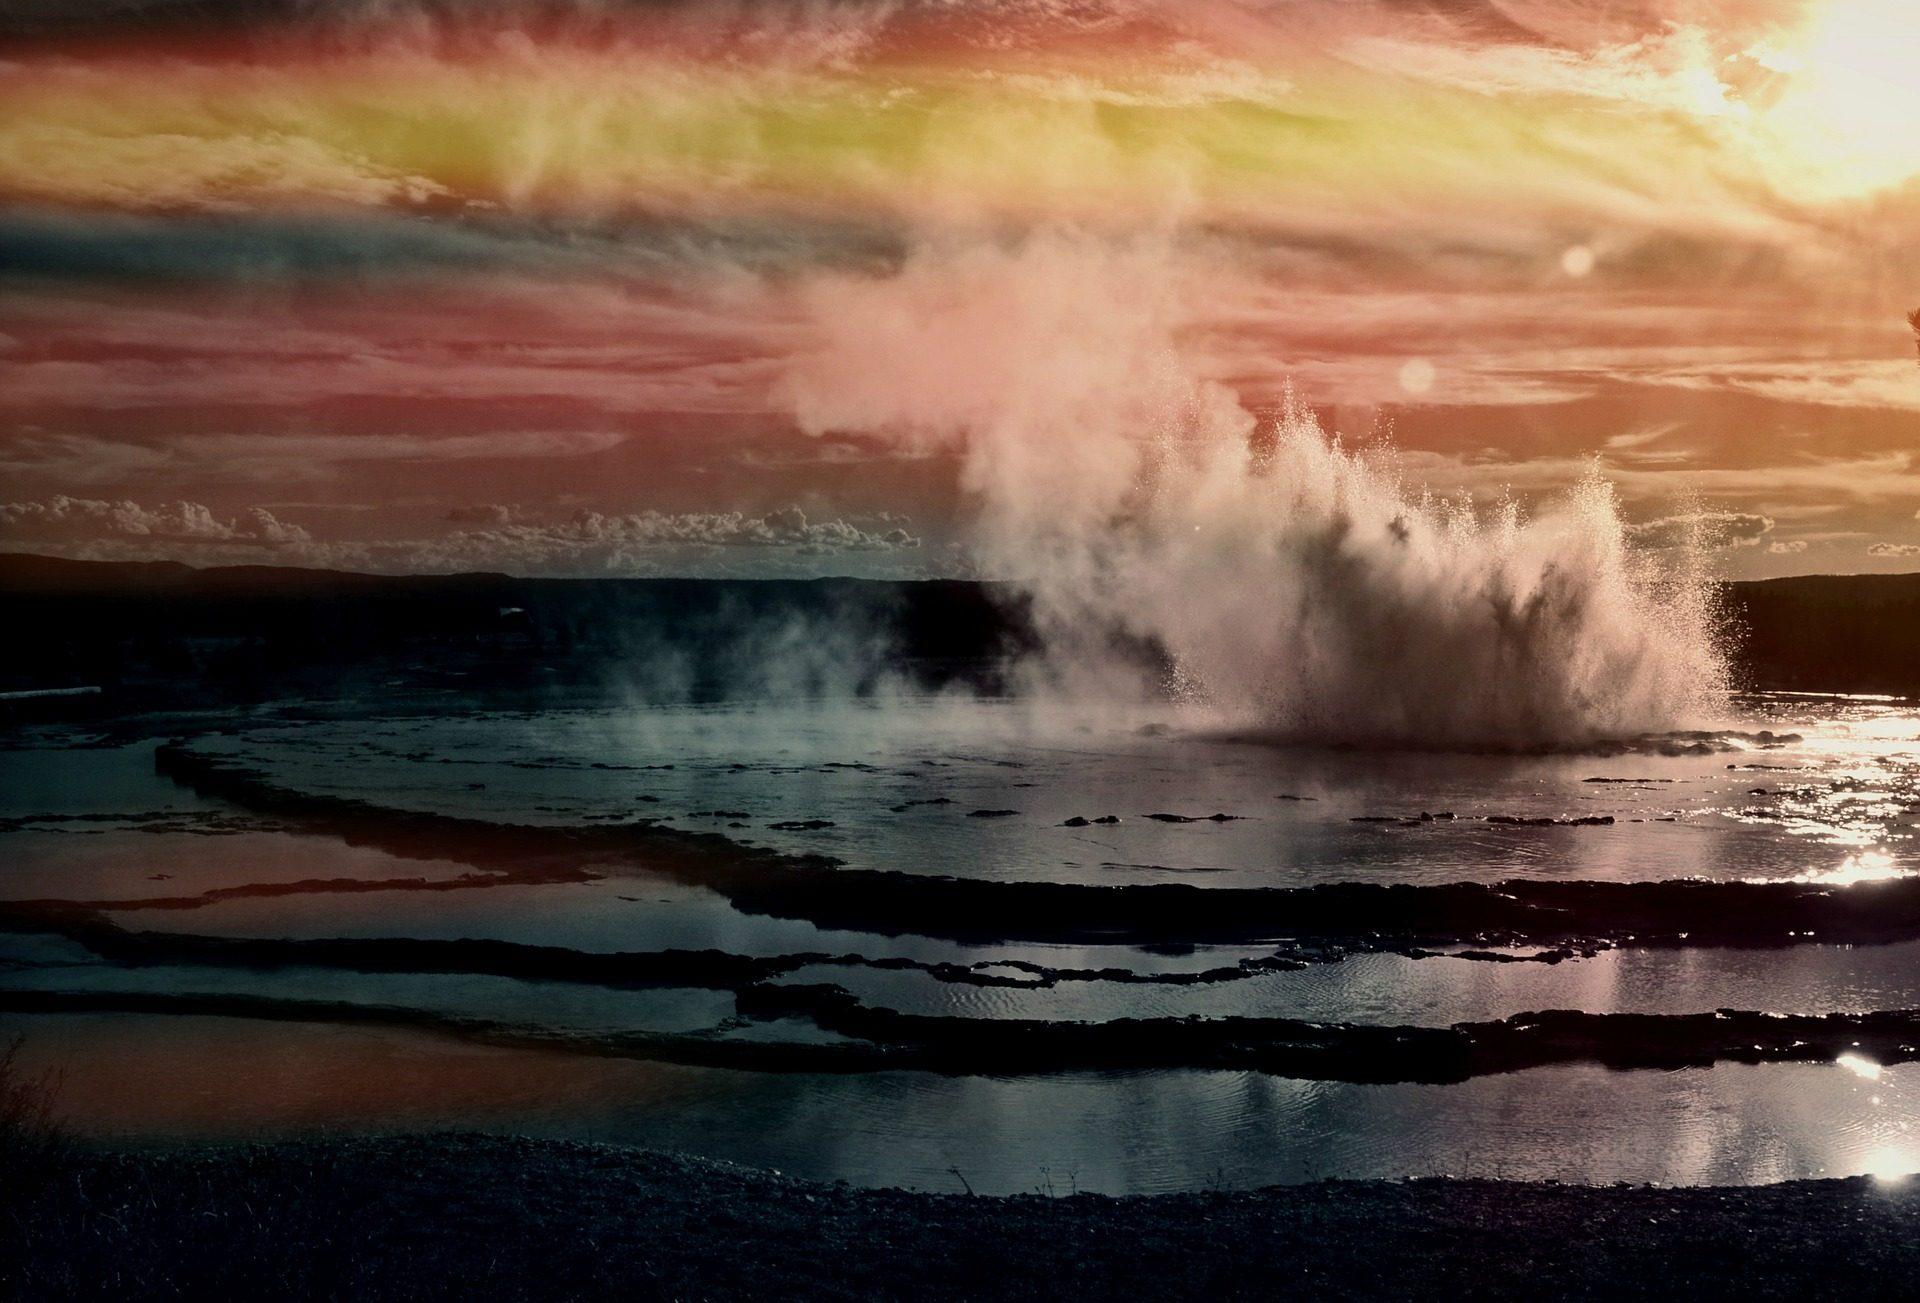 Geysir, Wasser, Dampf, Wärme, thermische, Yellowstone - Wallpaper HD - Prof.-falken.com